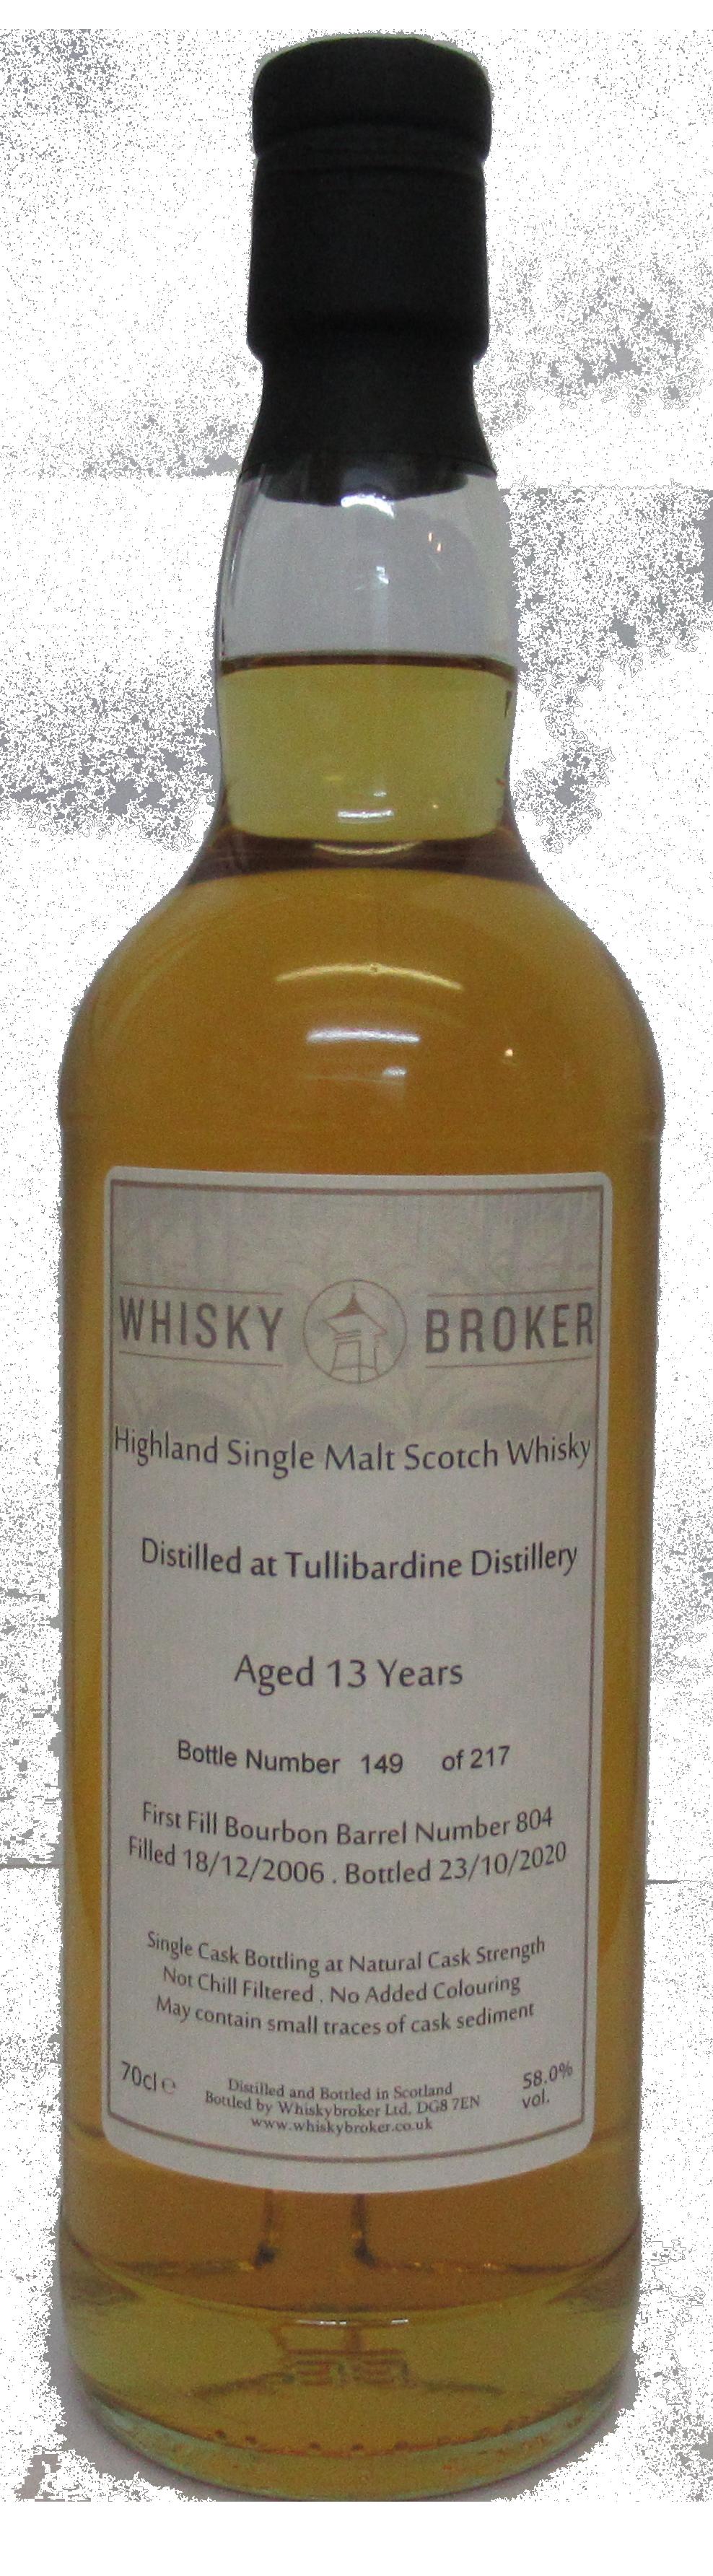 70cl, 13yo Distilled at Tullibardine Distillery